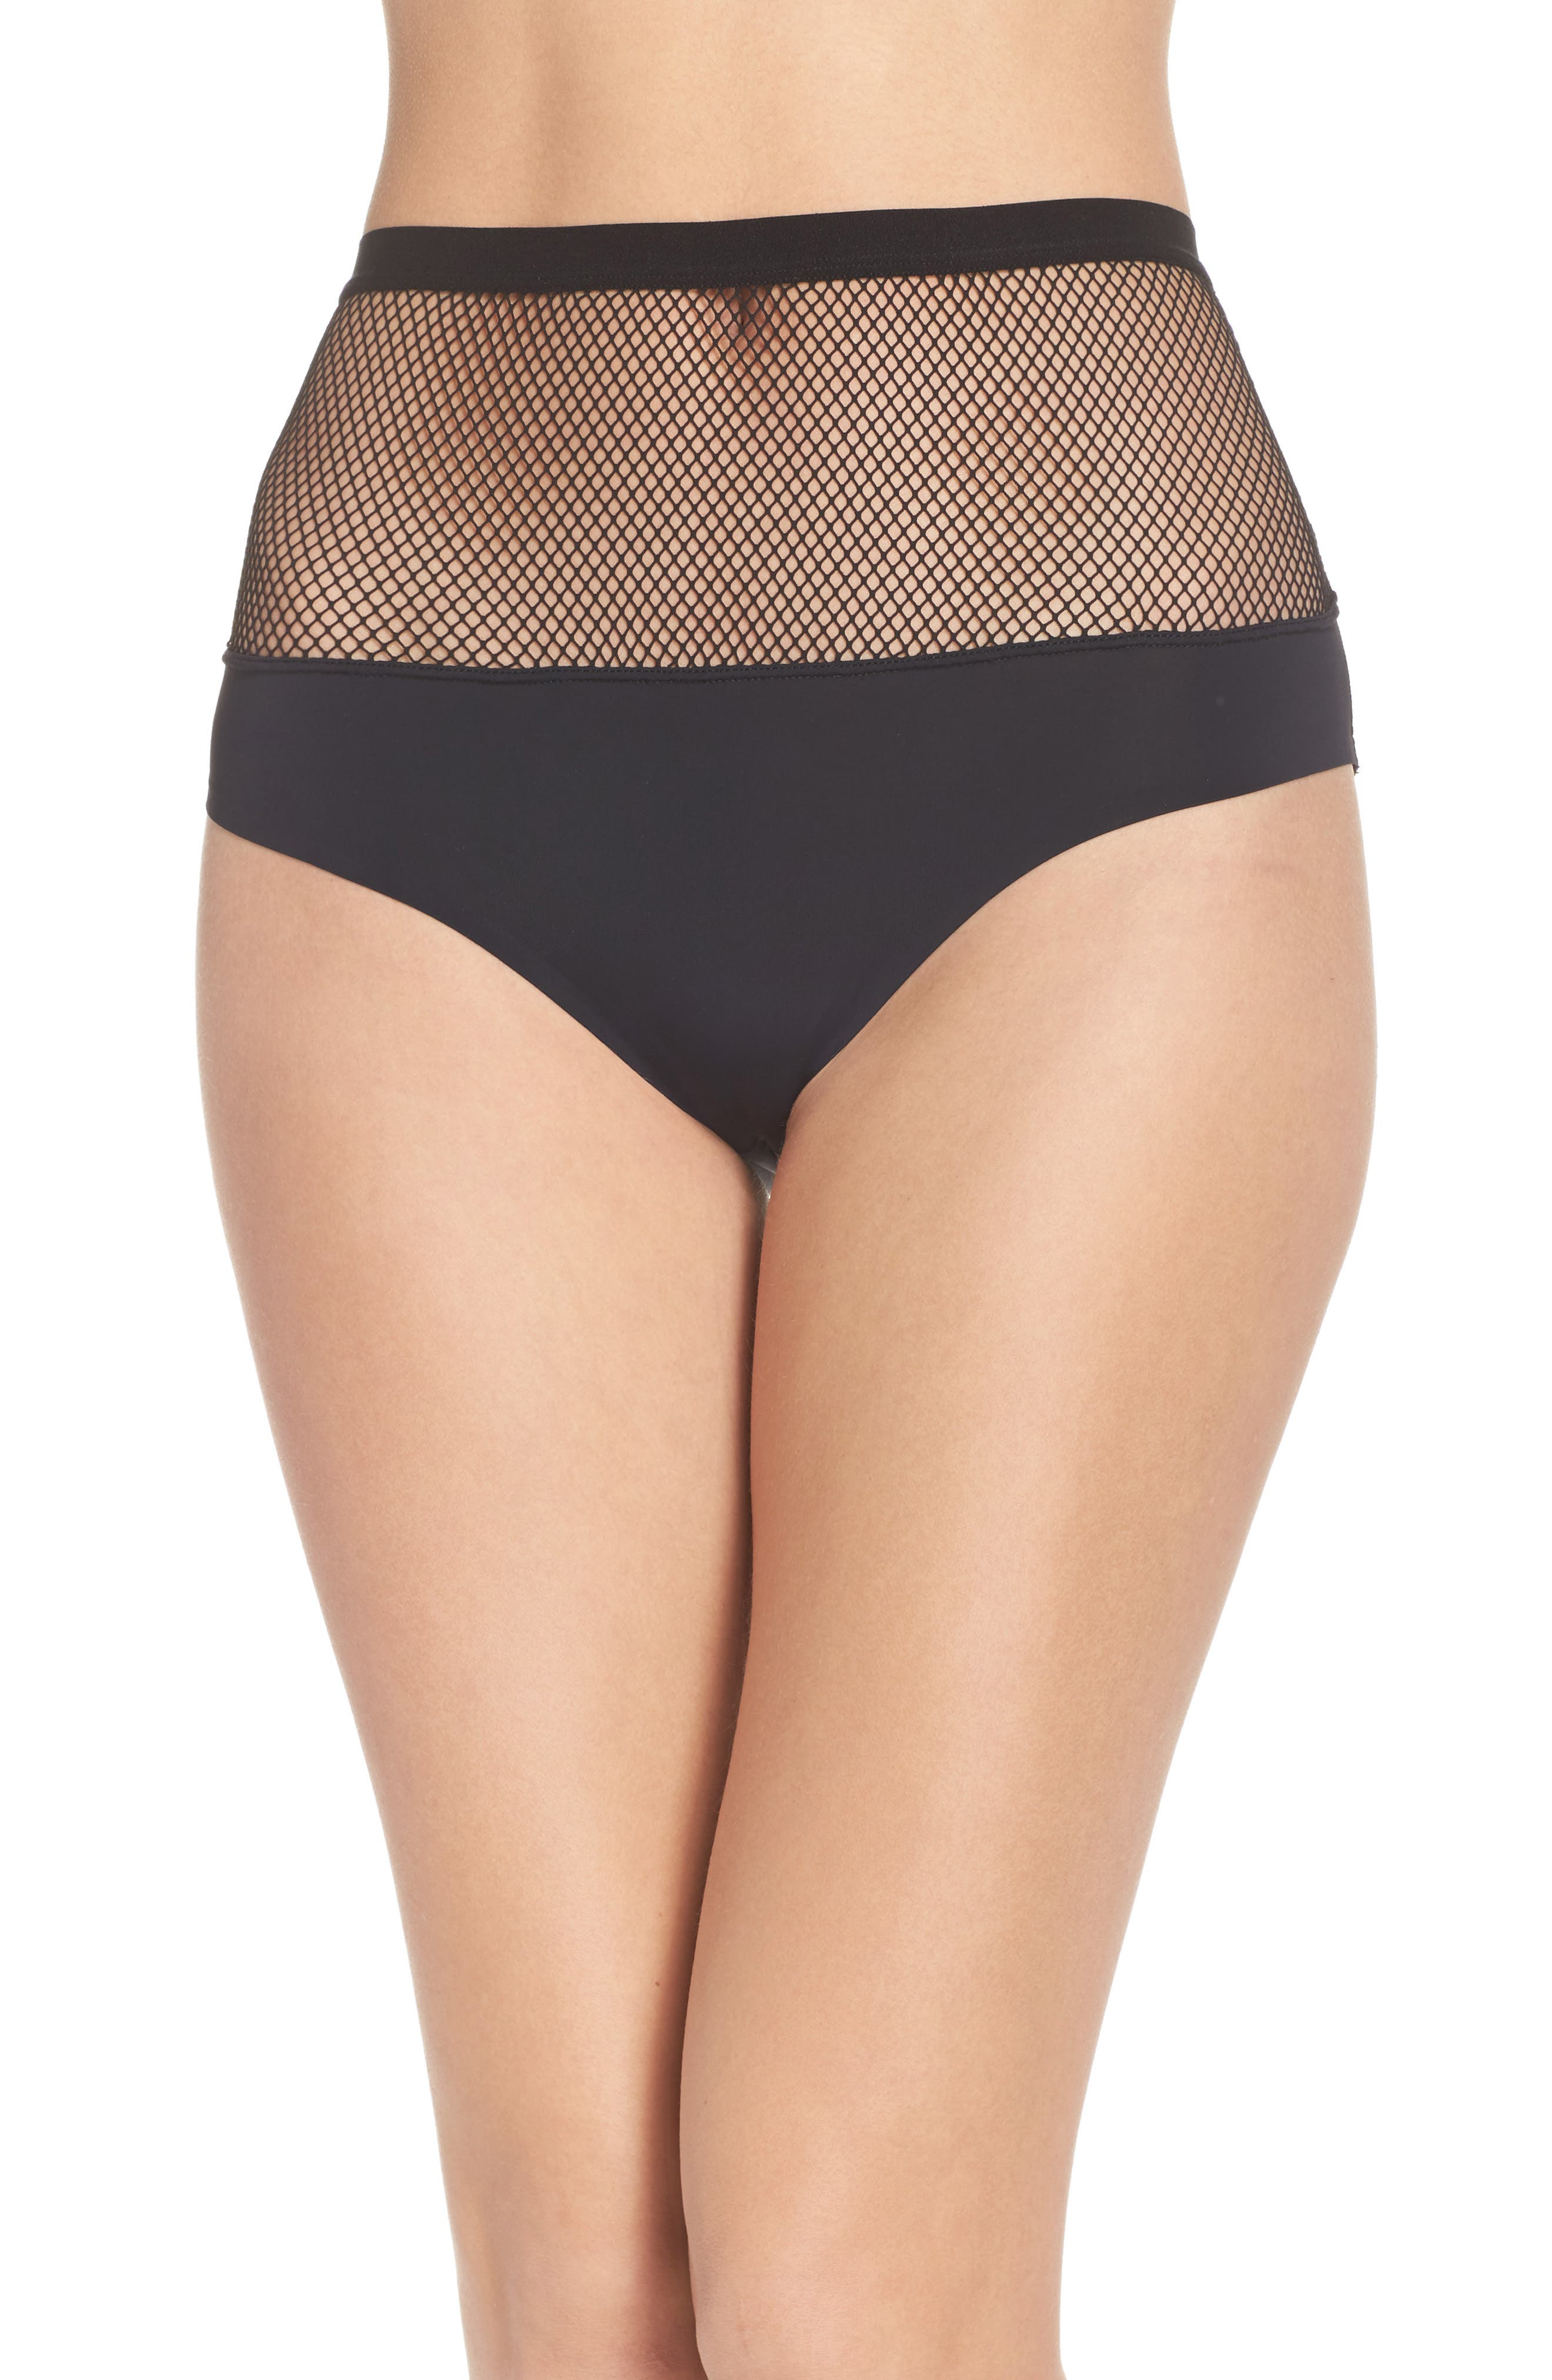 Honeydew Fishnet Hipster Panties